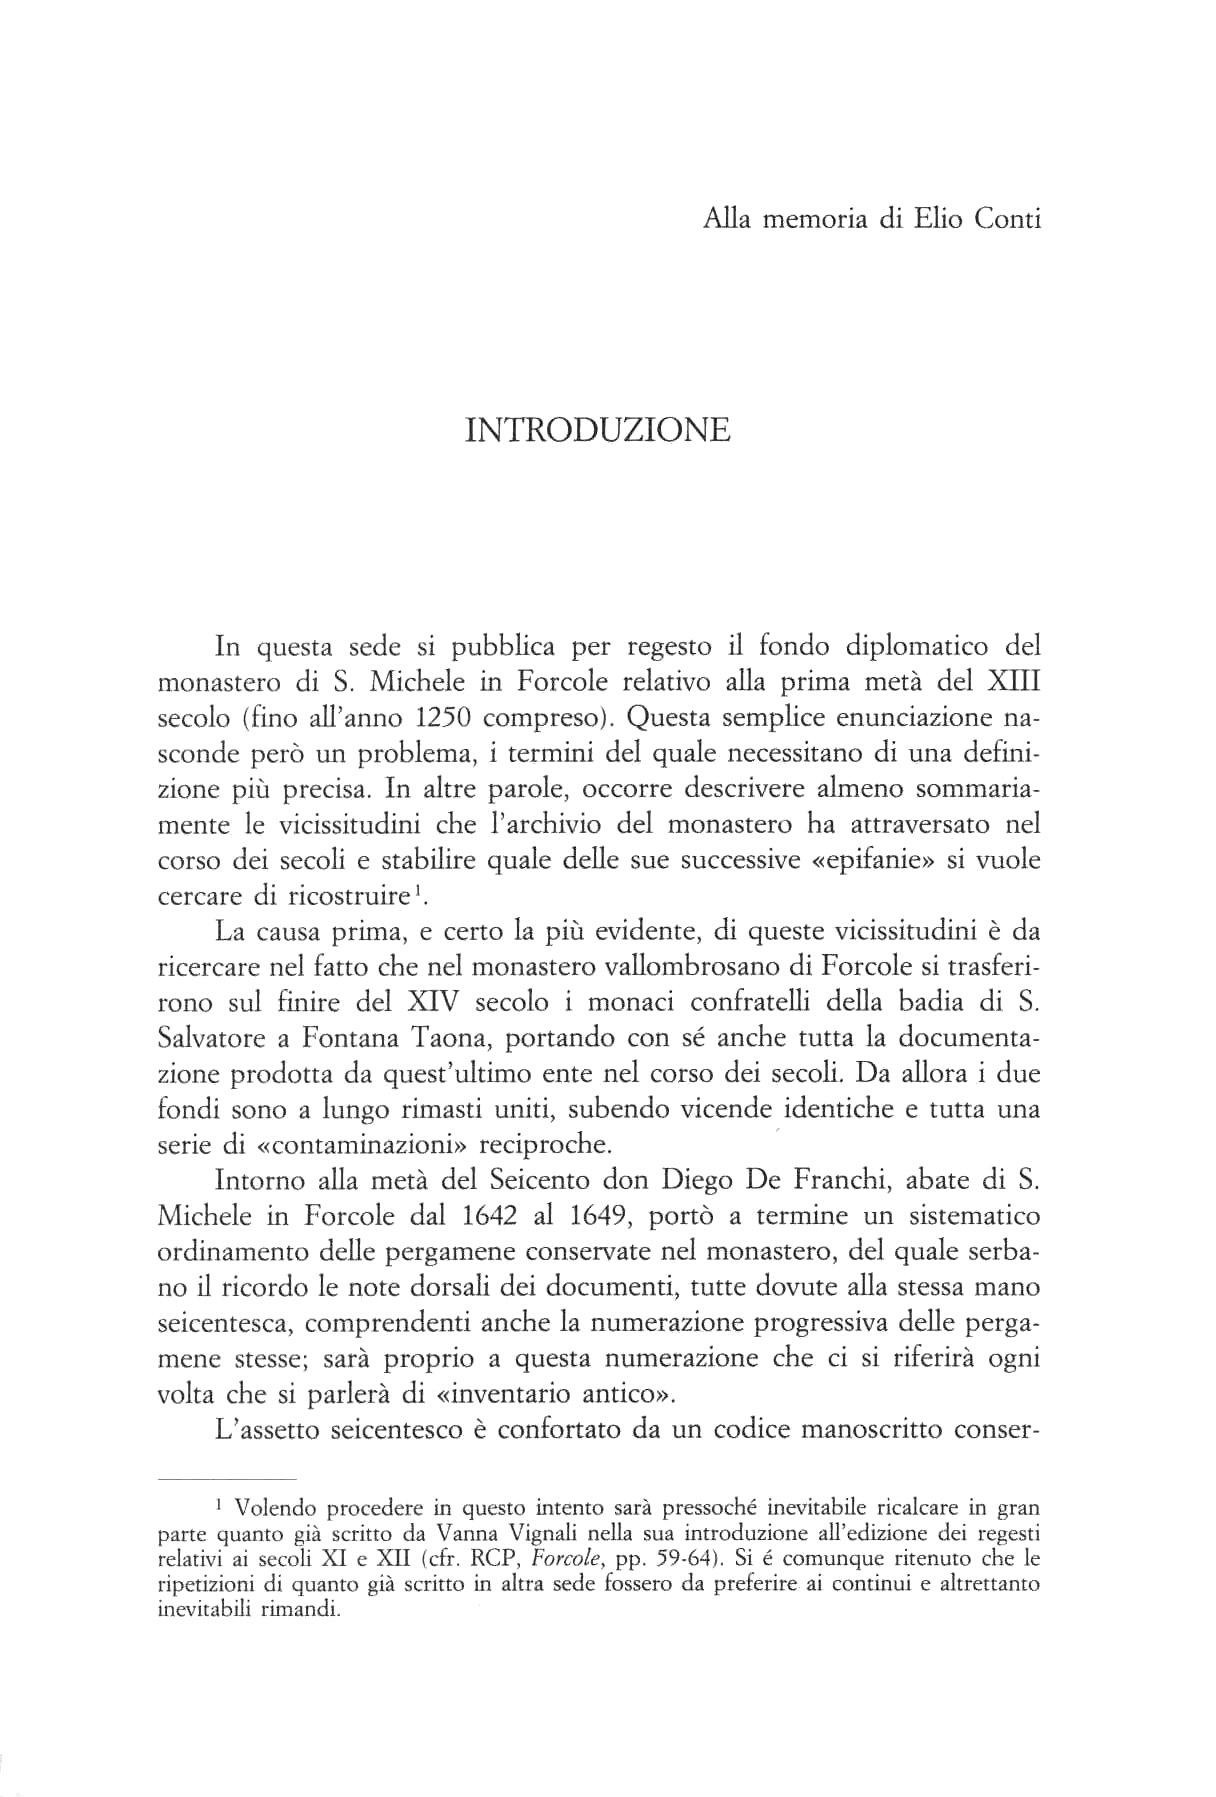 !Monastero Forcole 00005.jpg